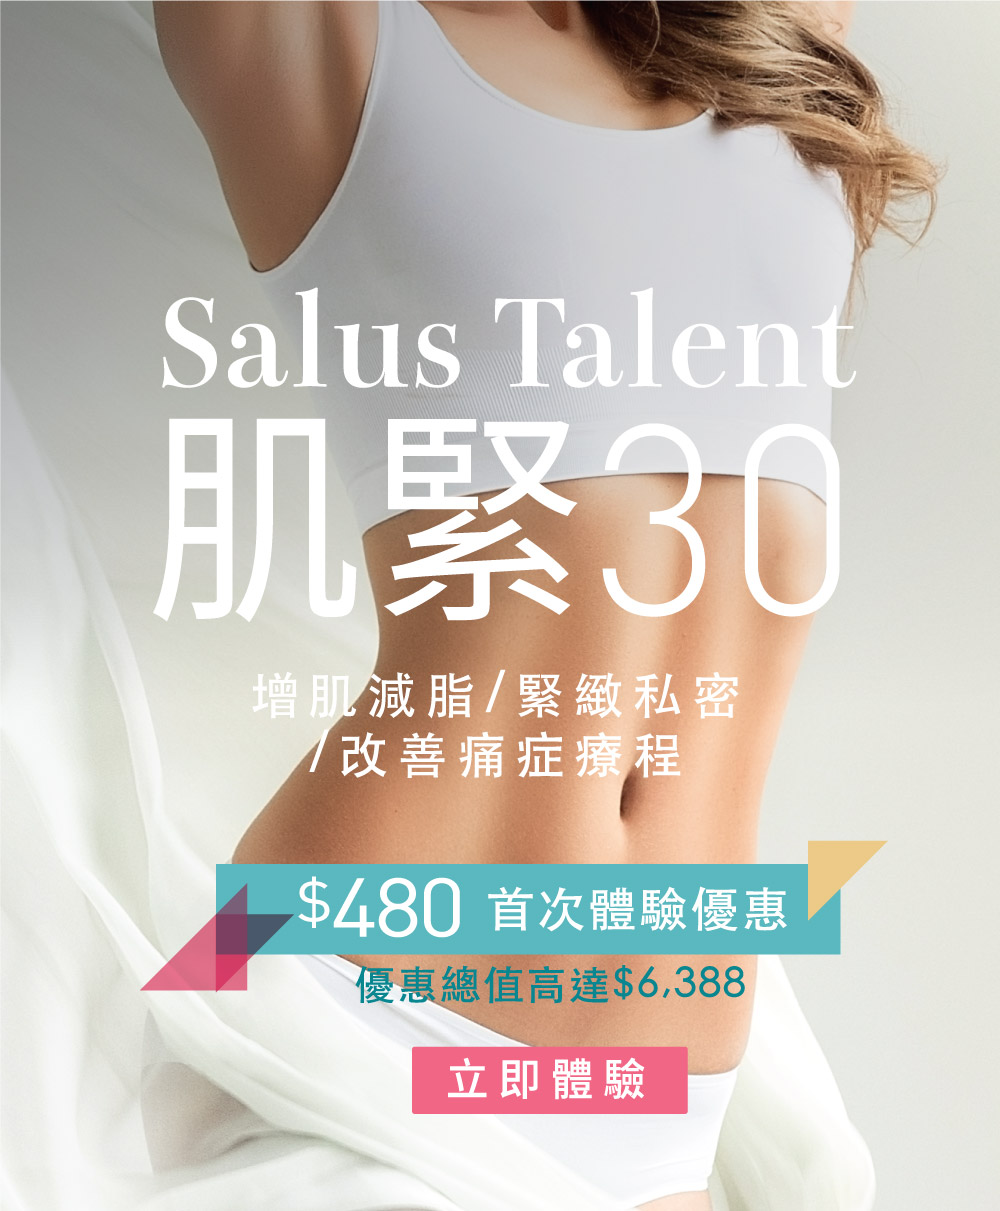 Salus Talent肌緊30增肌減脂/緊緻私密/改善痛症療程